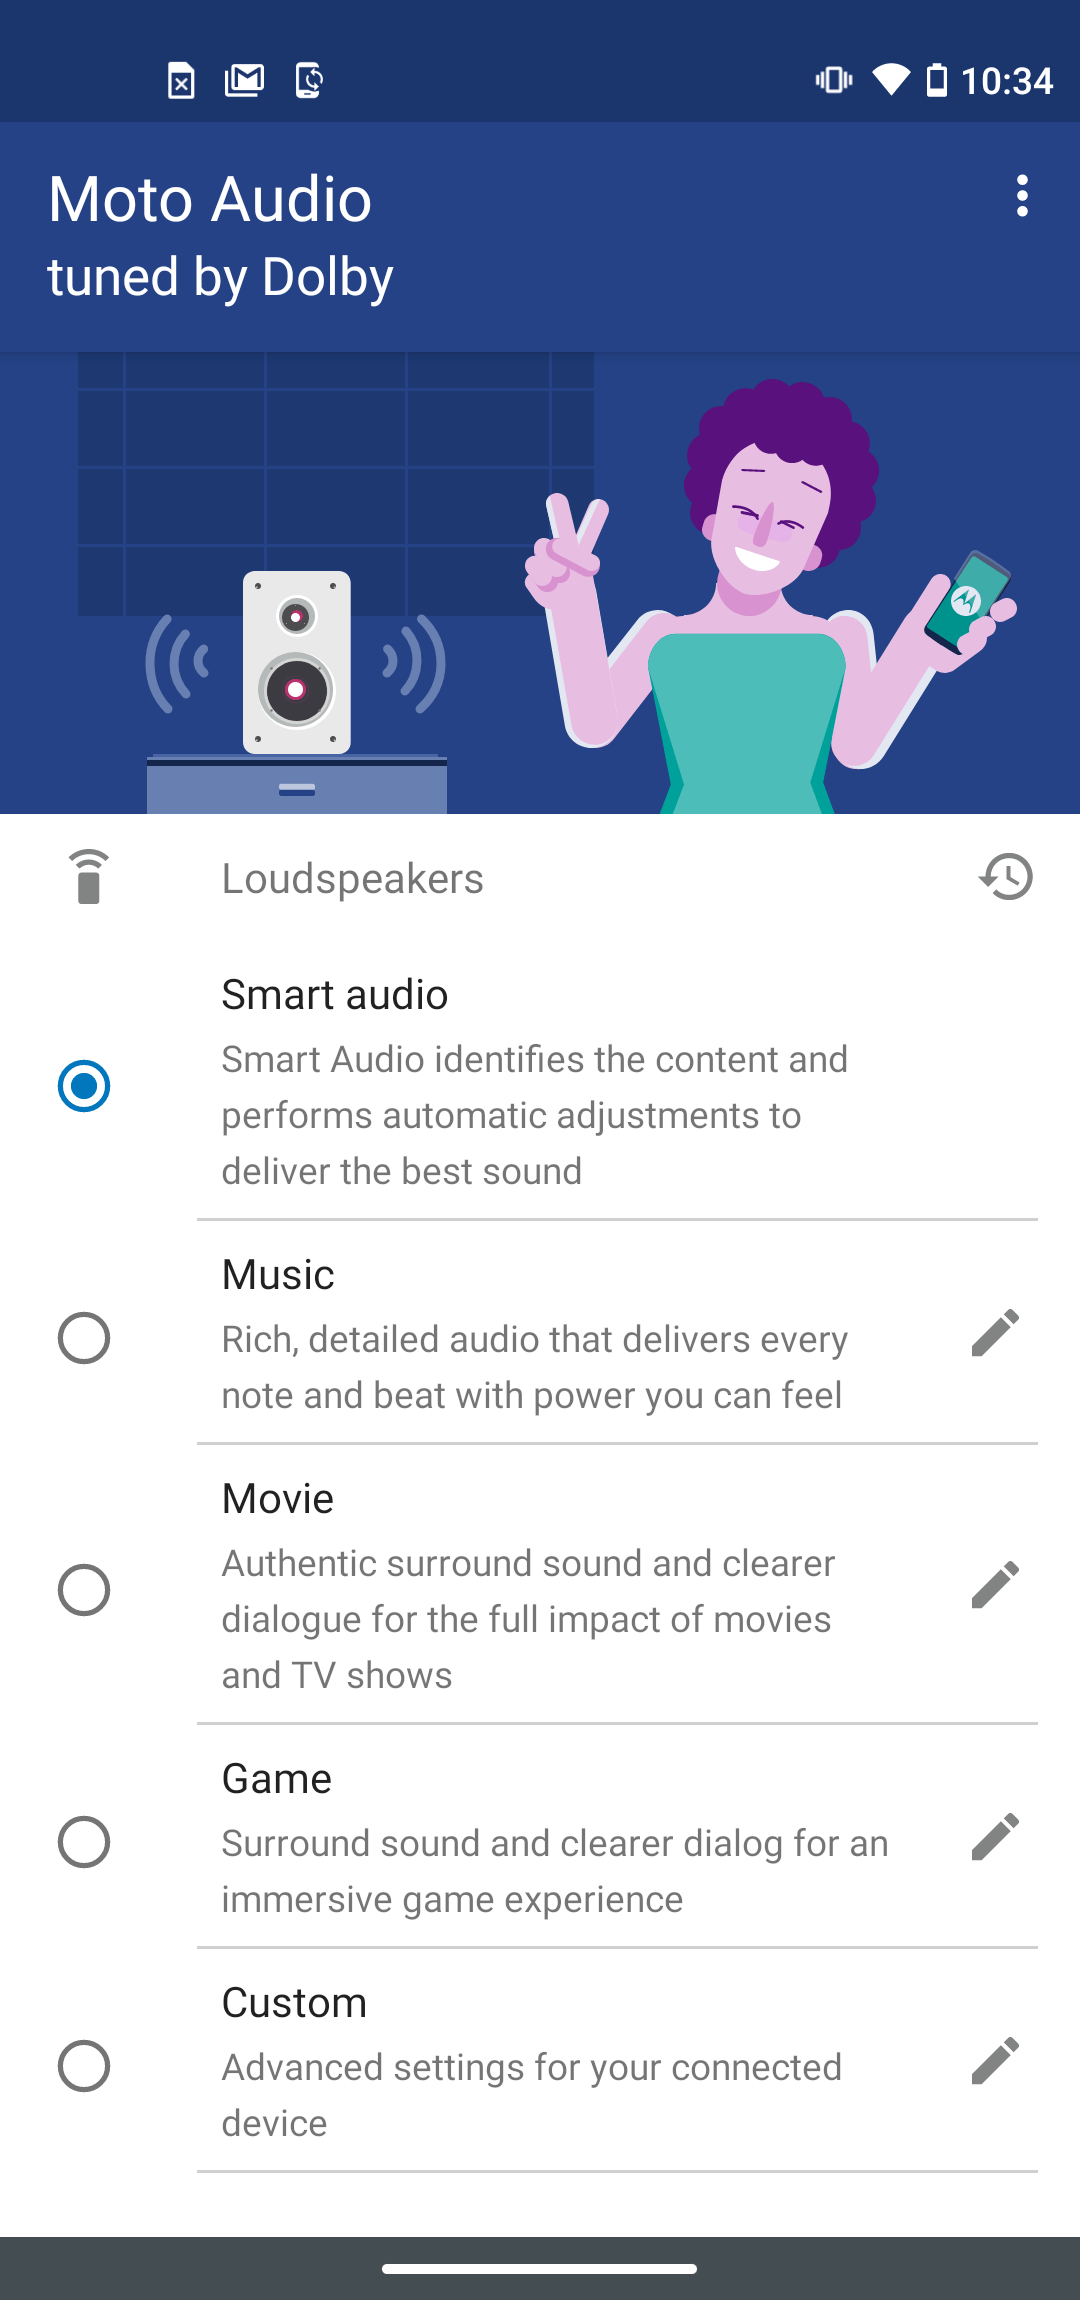 Motorola Moto G8 Power Review Romana si Pareri - Sceenshot 2